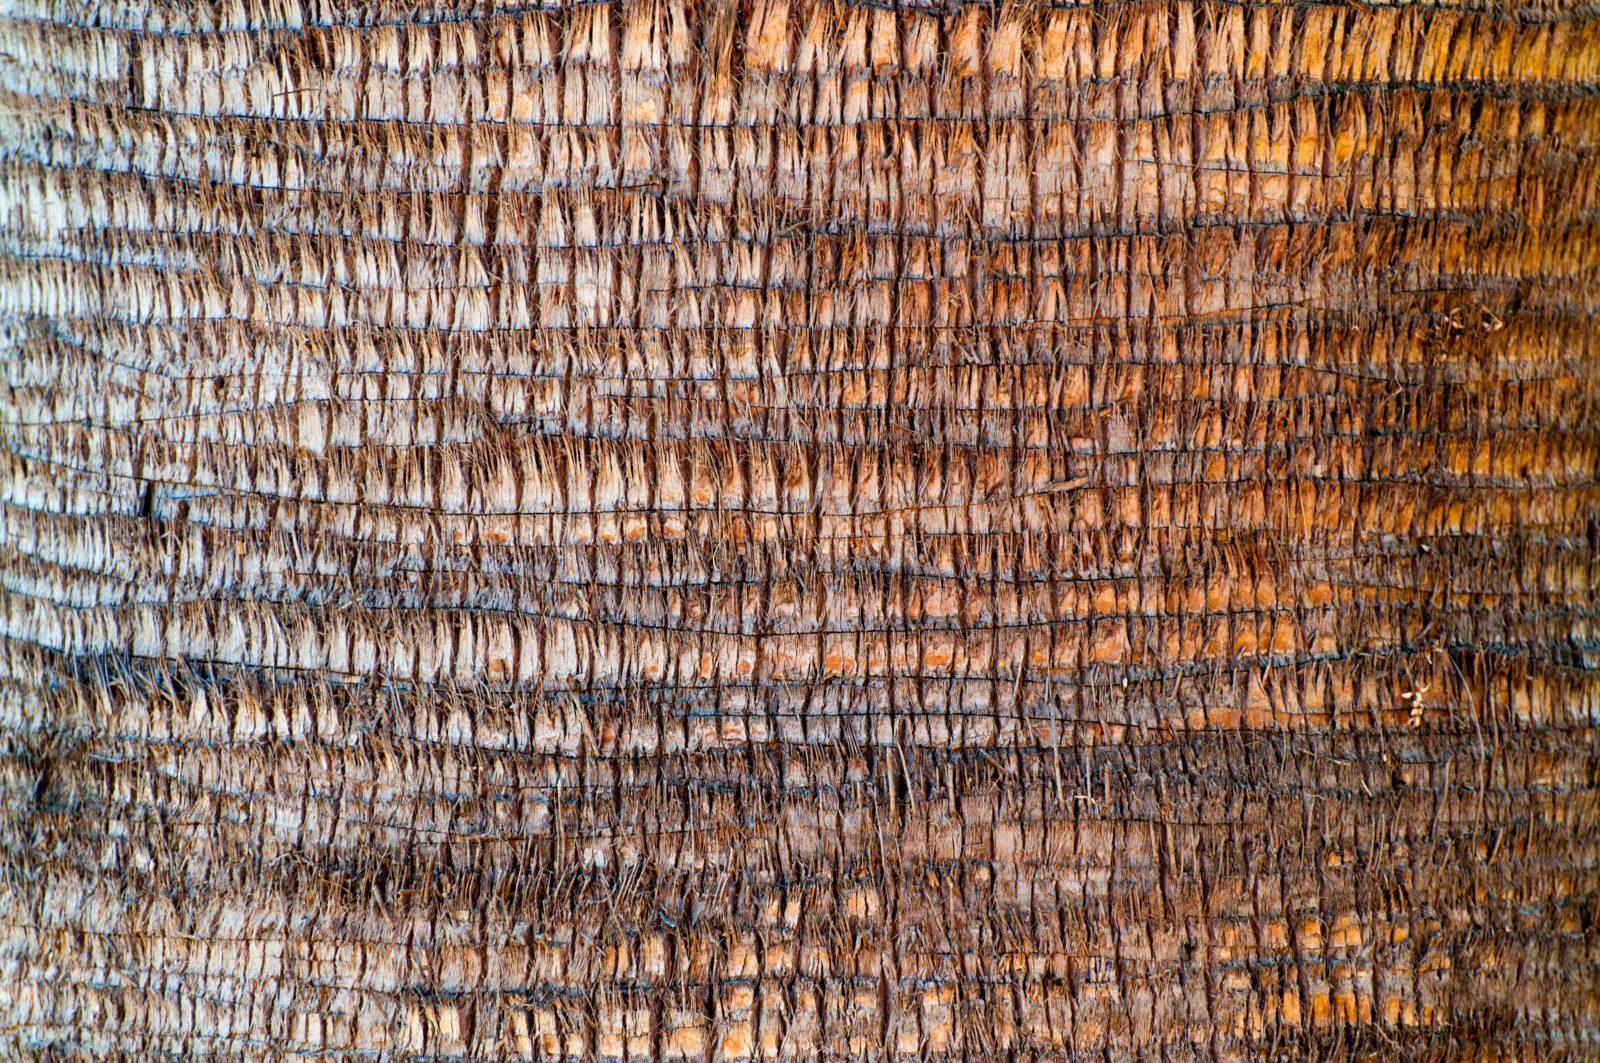 Coconut Tree Trunk Free Photo Texture